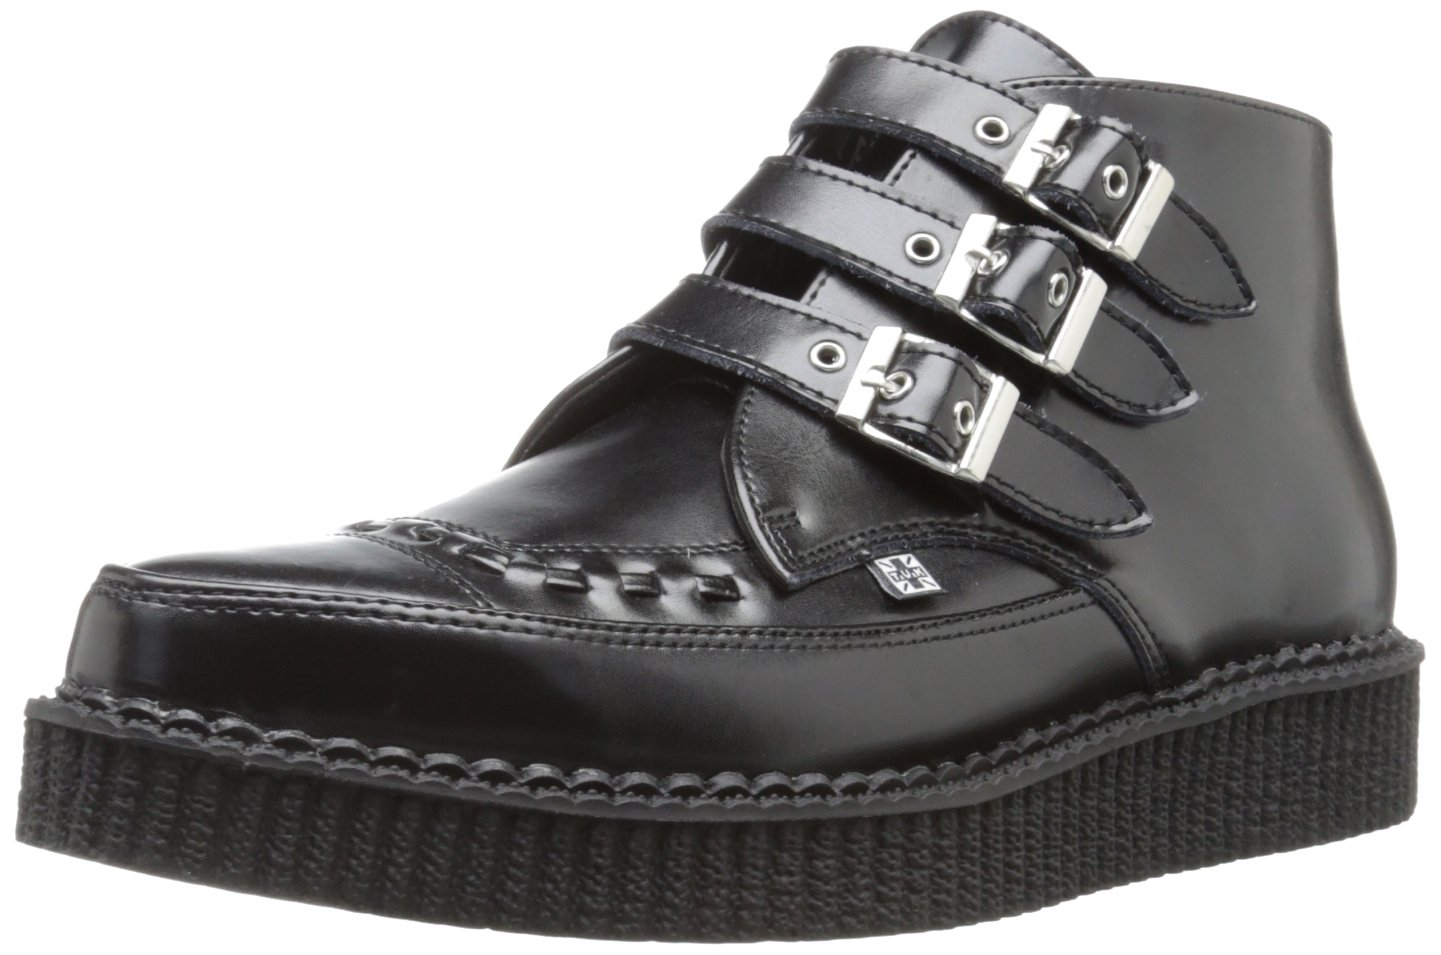 T.U.K. Unisex A8503 Creeper Boot B00B8PIDR8 Men's 4 M/Women's 6 M|Black